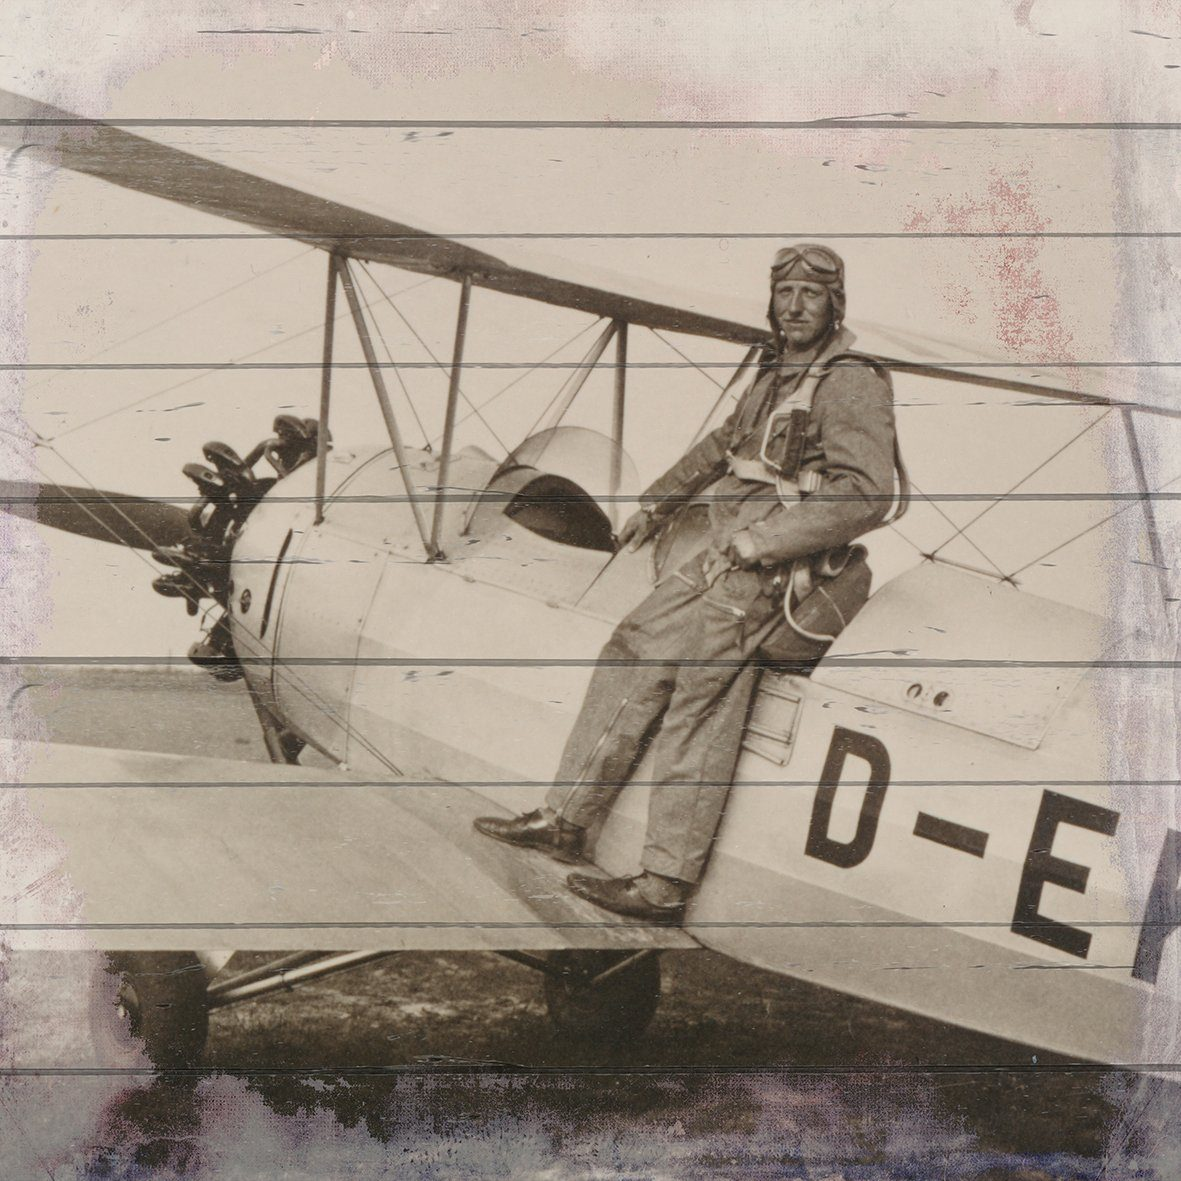 QUEENCE Holzbild »Altes Flugzeug mit Pilot«, 40x40 cm Echtholz